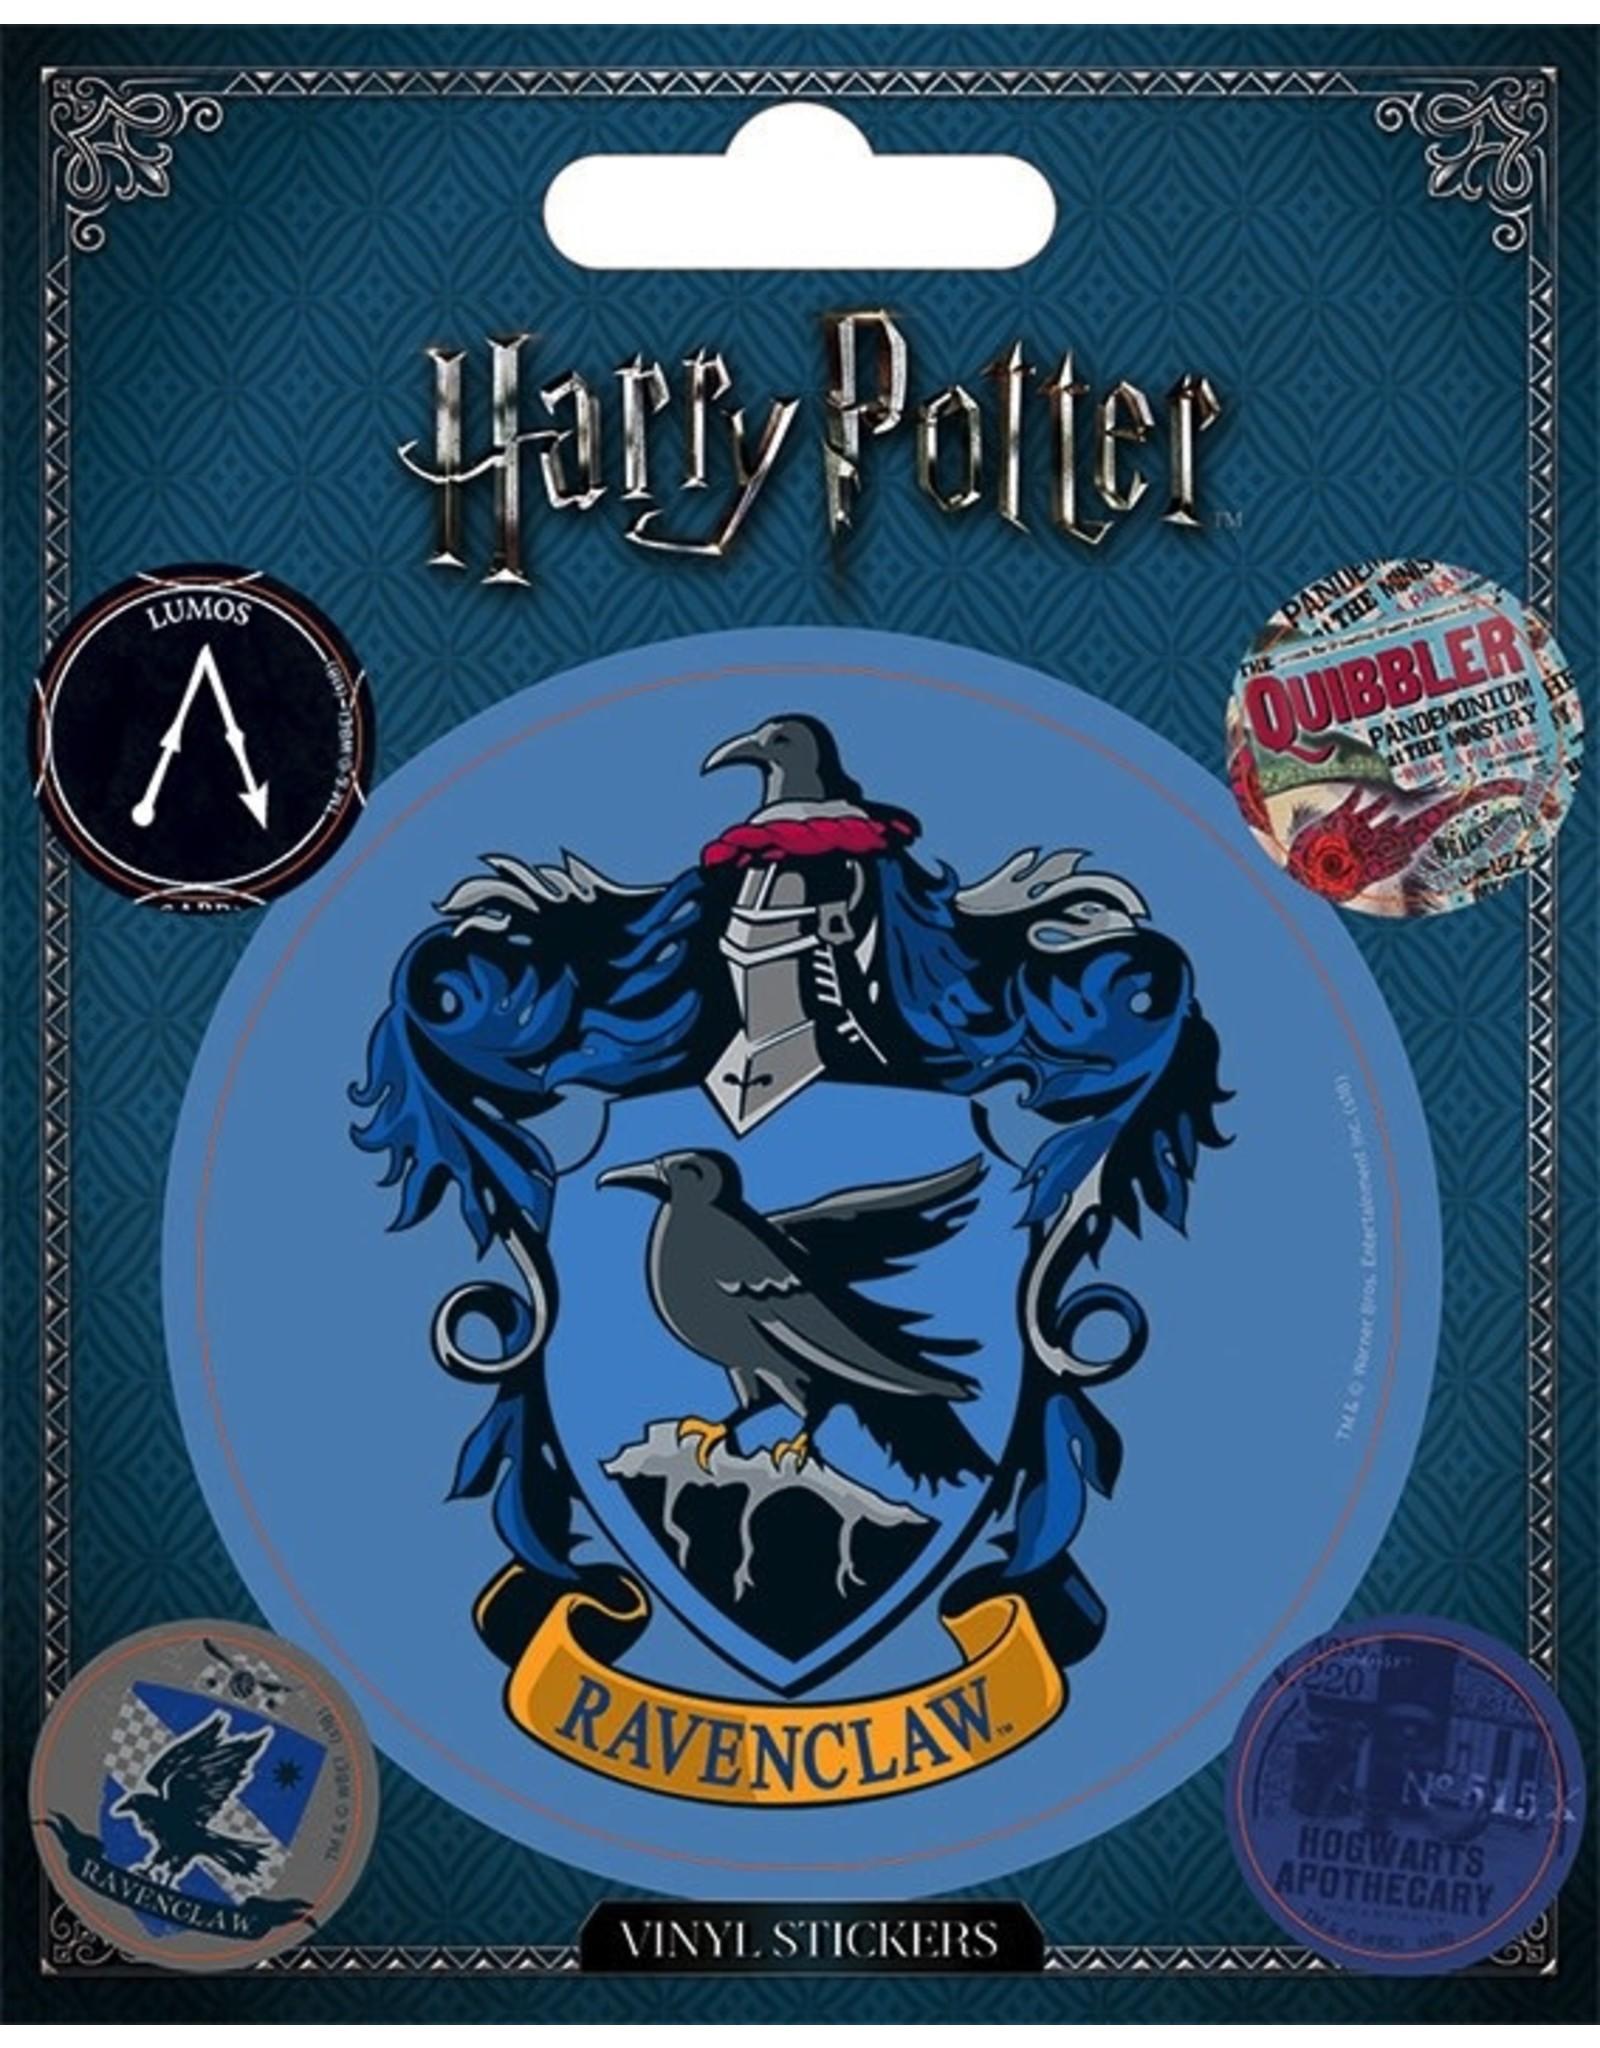 HARRY POTTER - Vinyl Stickers - Ravenclaw